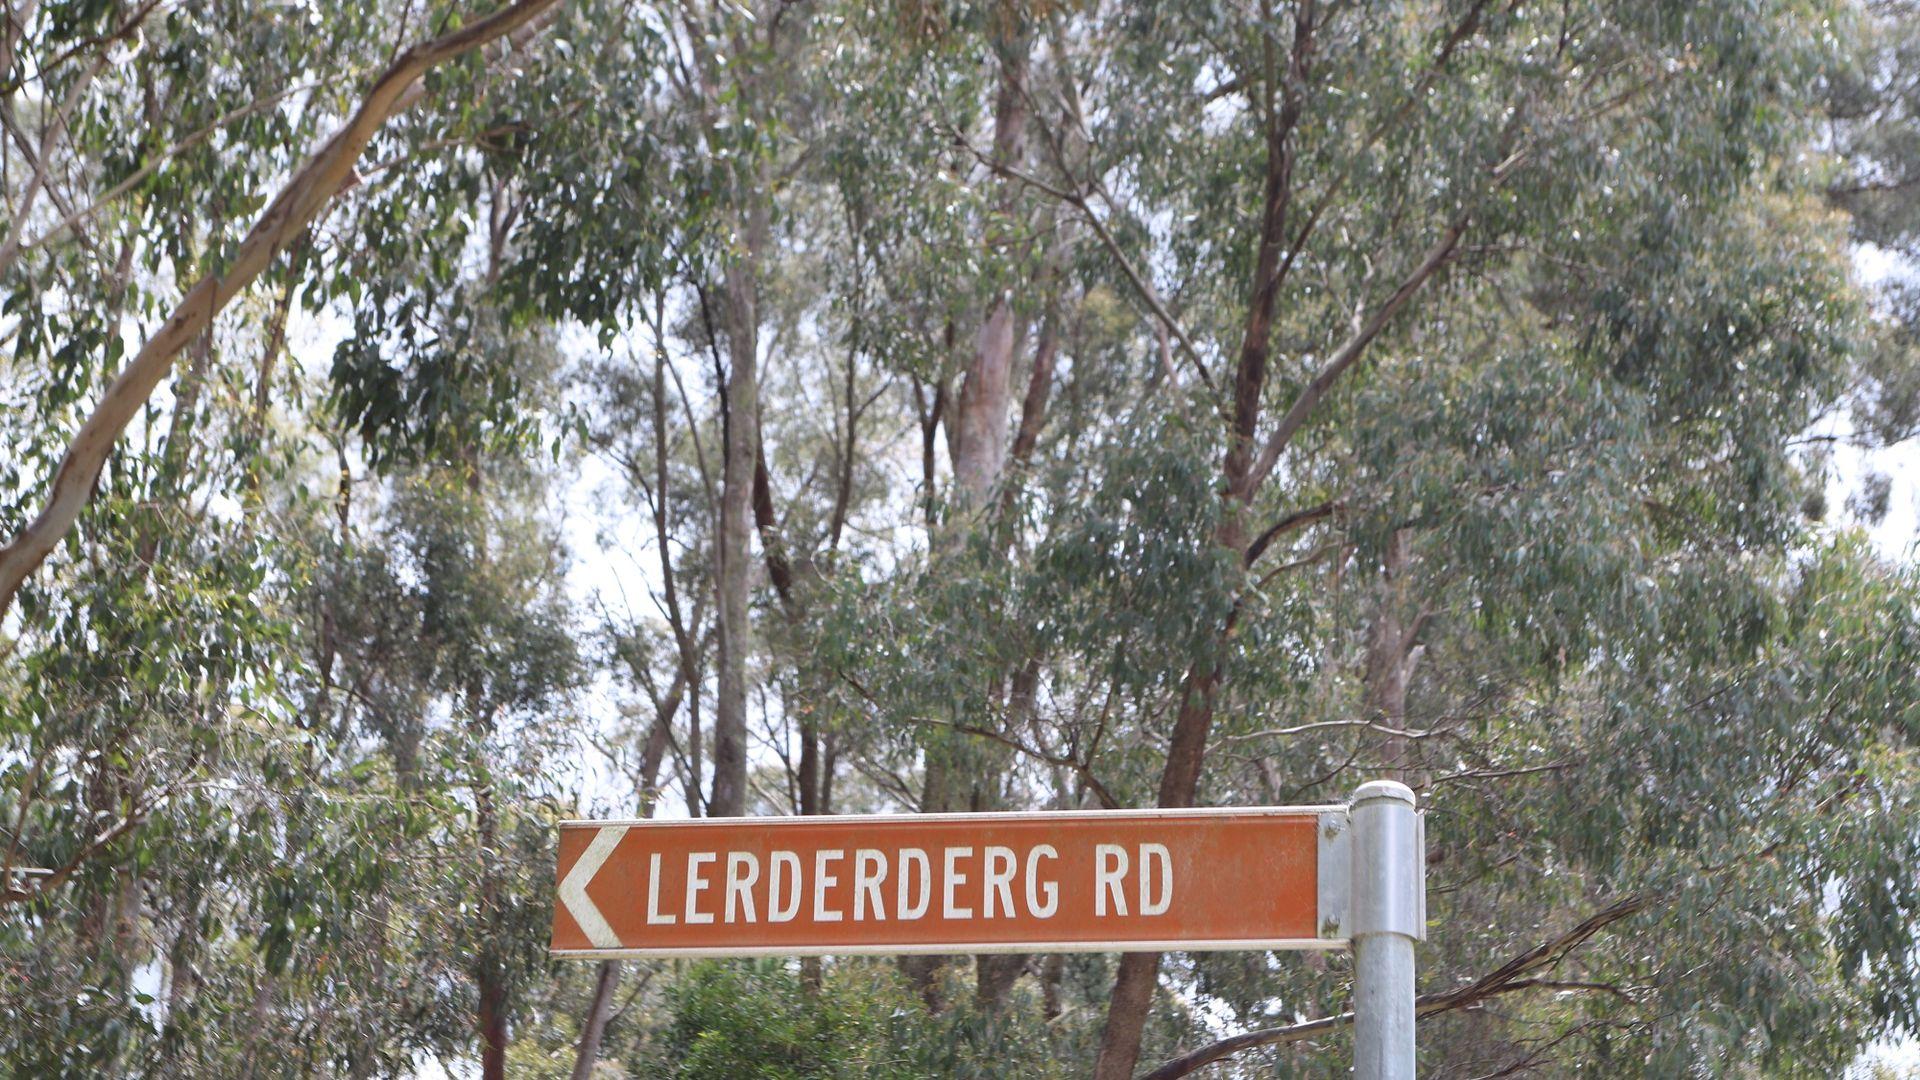 CA 9, 10,11,12,13 Section J Lerderderg Road, Blackwood VIC 3458, Image 1